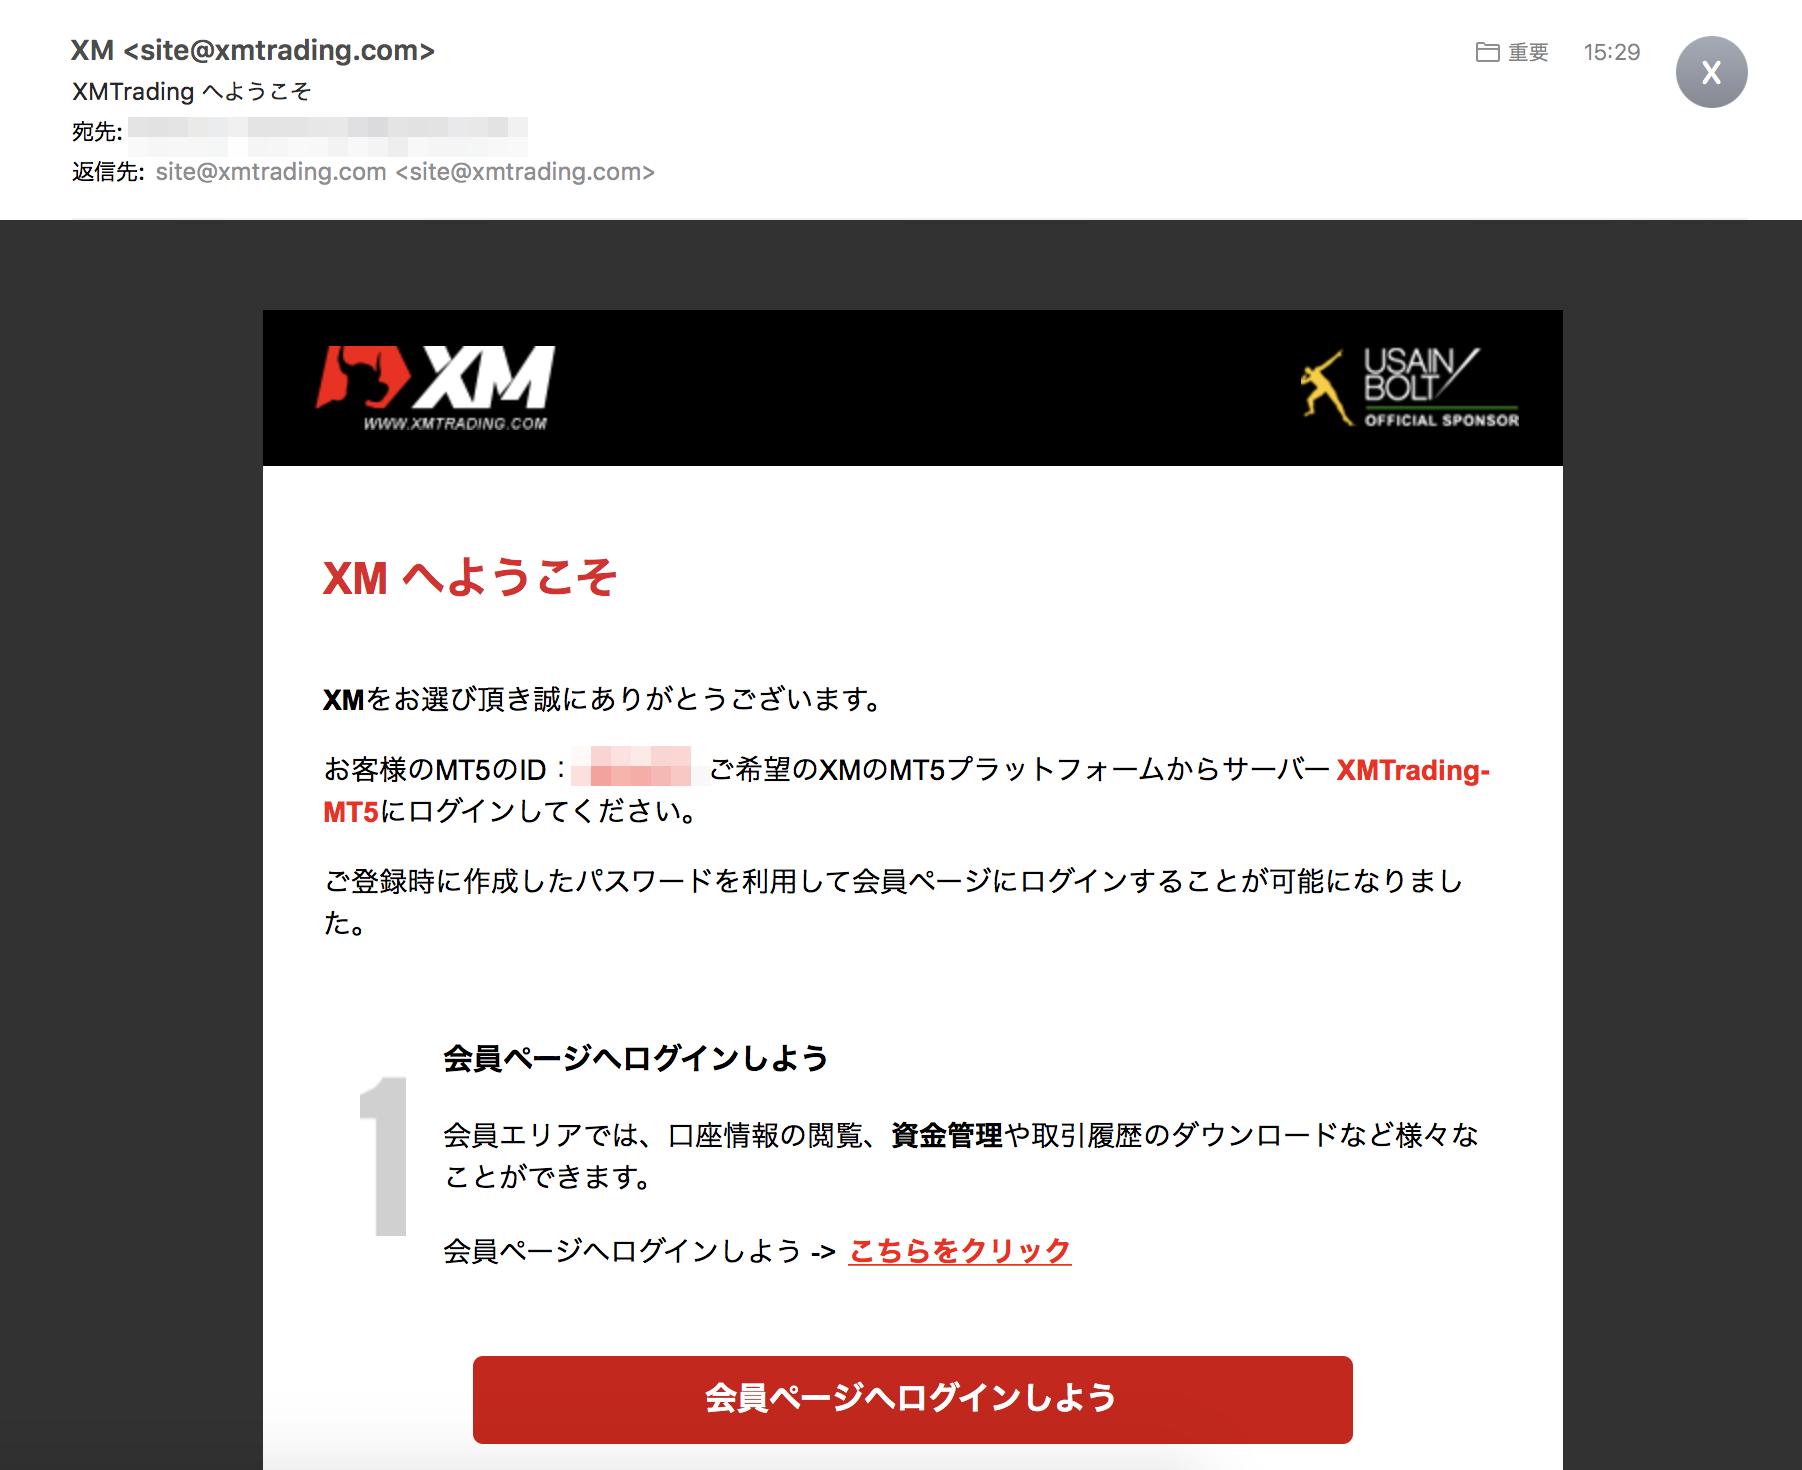 XM追加口座 - 口座開設完了メール